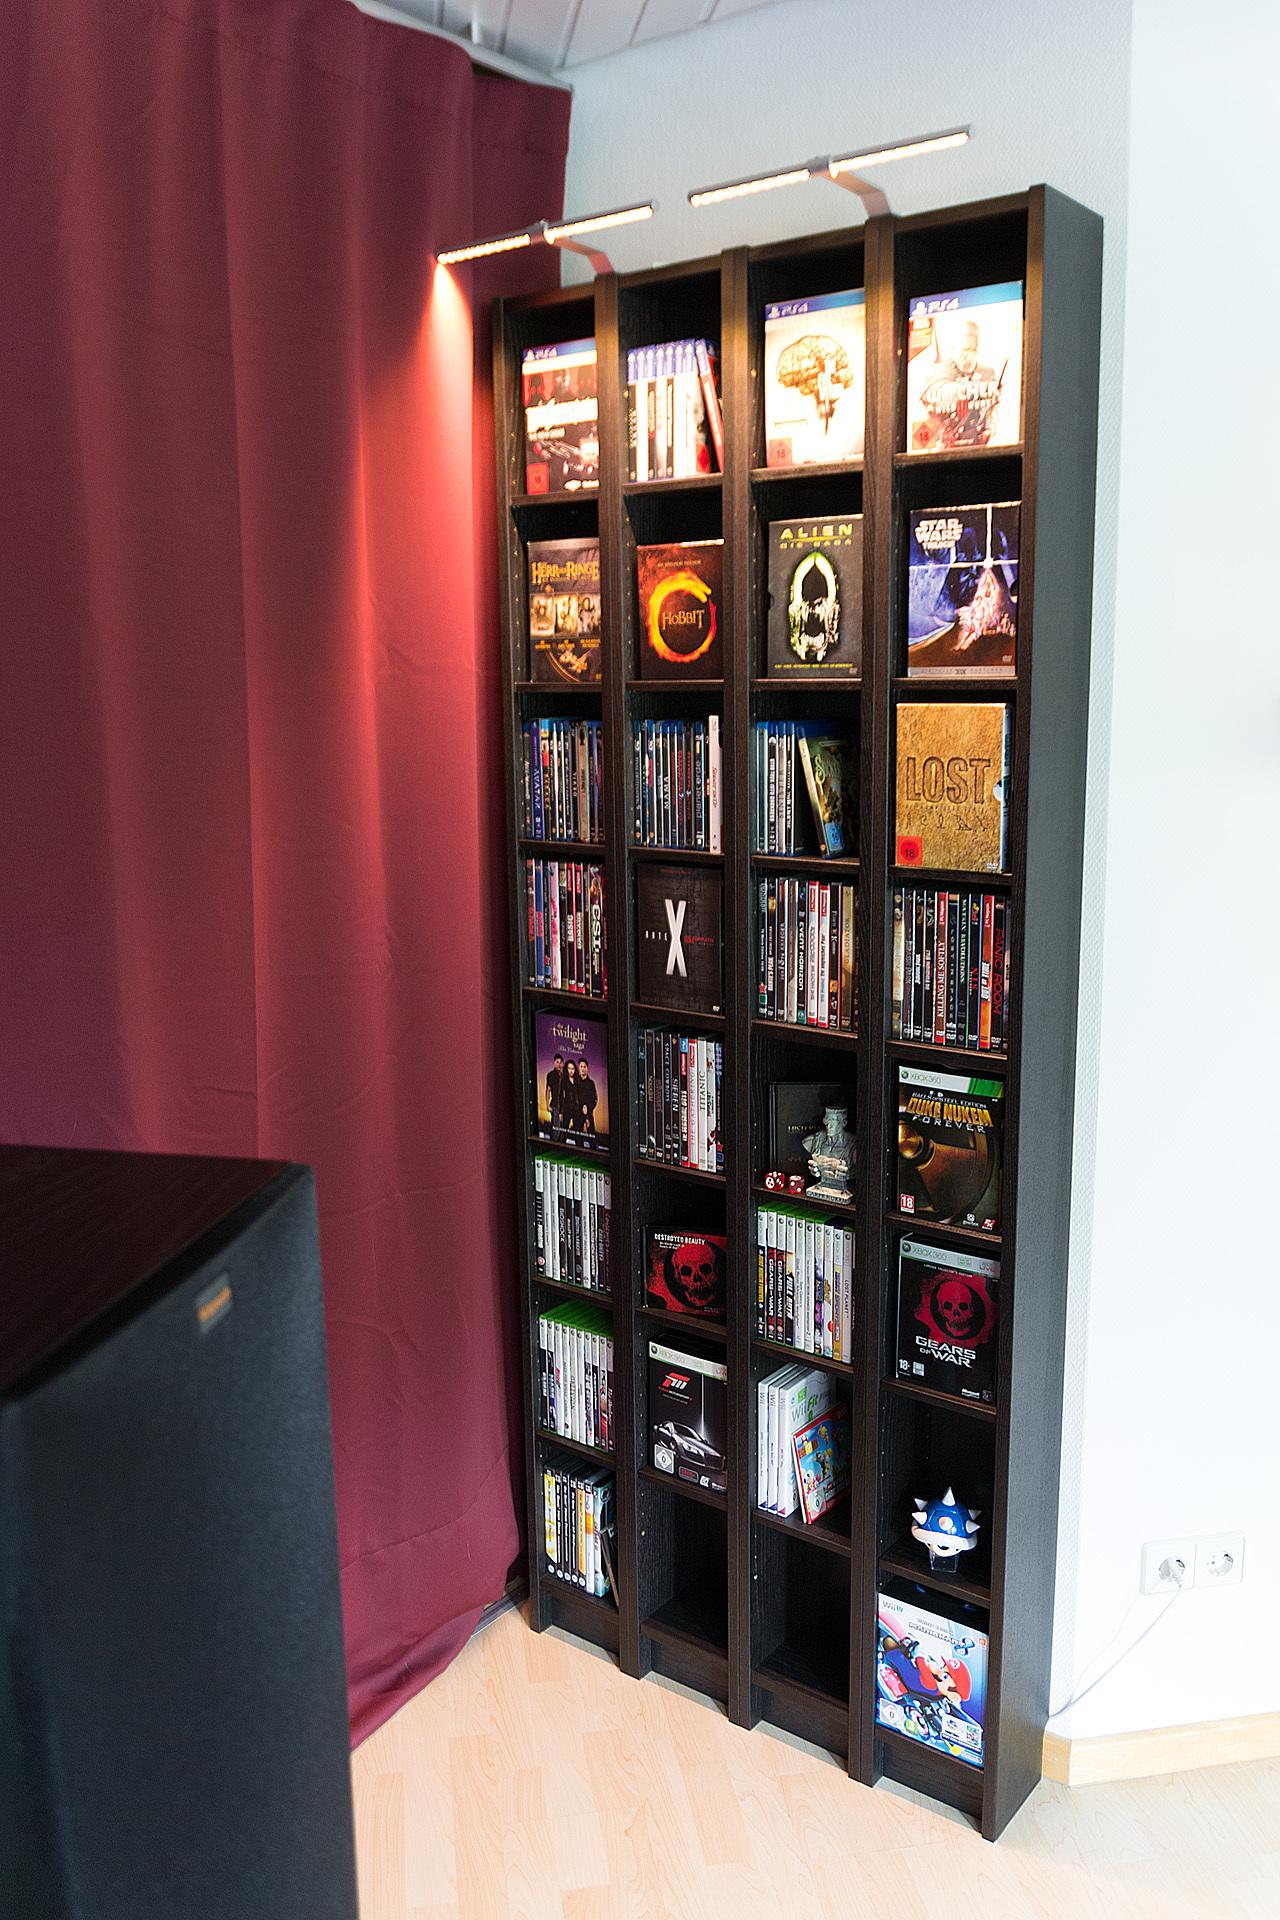 heimkino deko aliens deko heimkino queen hifi bildergalerie. Black Bedroom Furniture Sets. Home Design Ideas